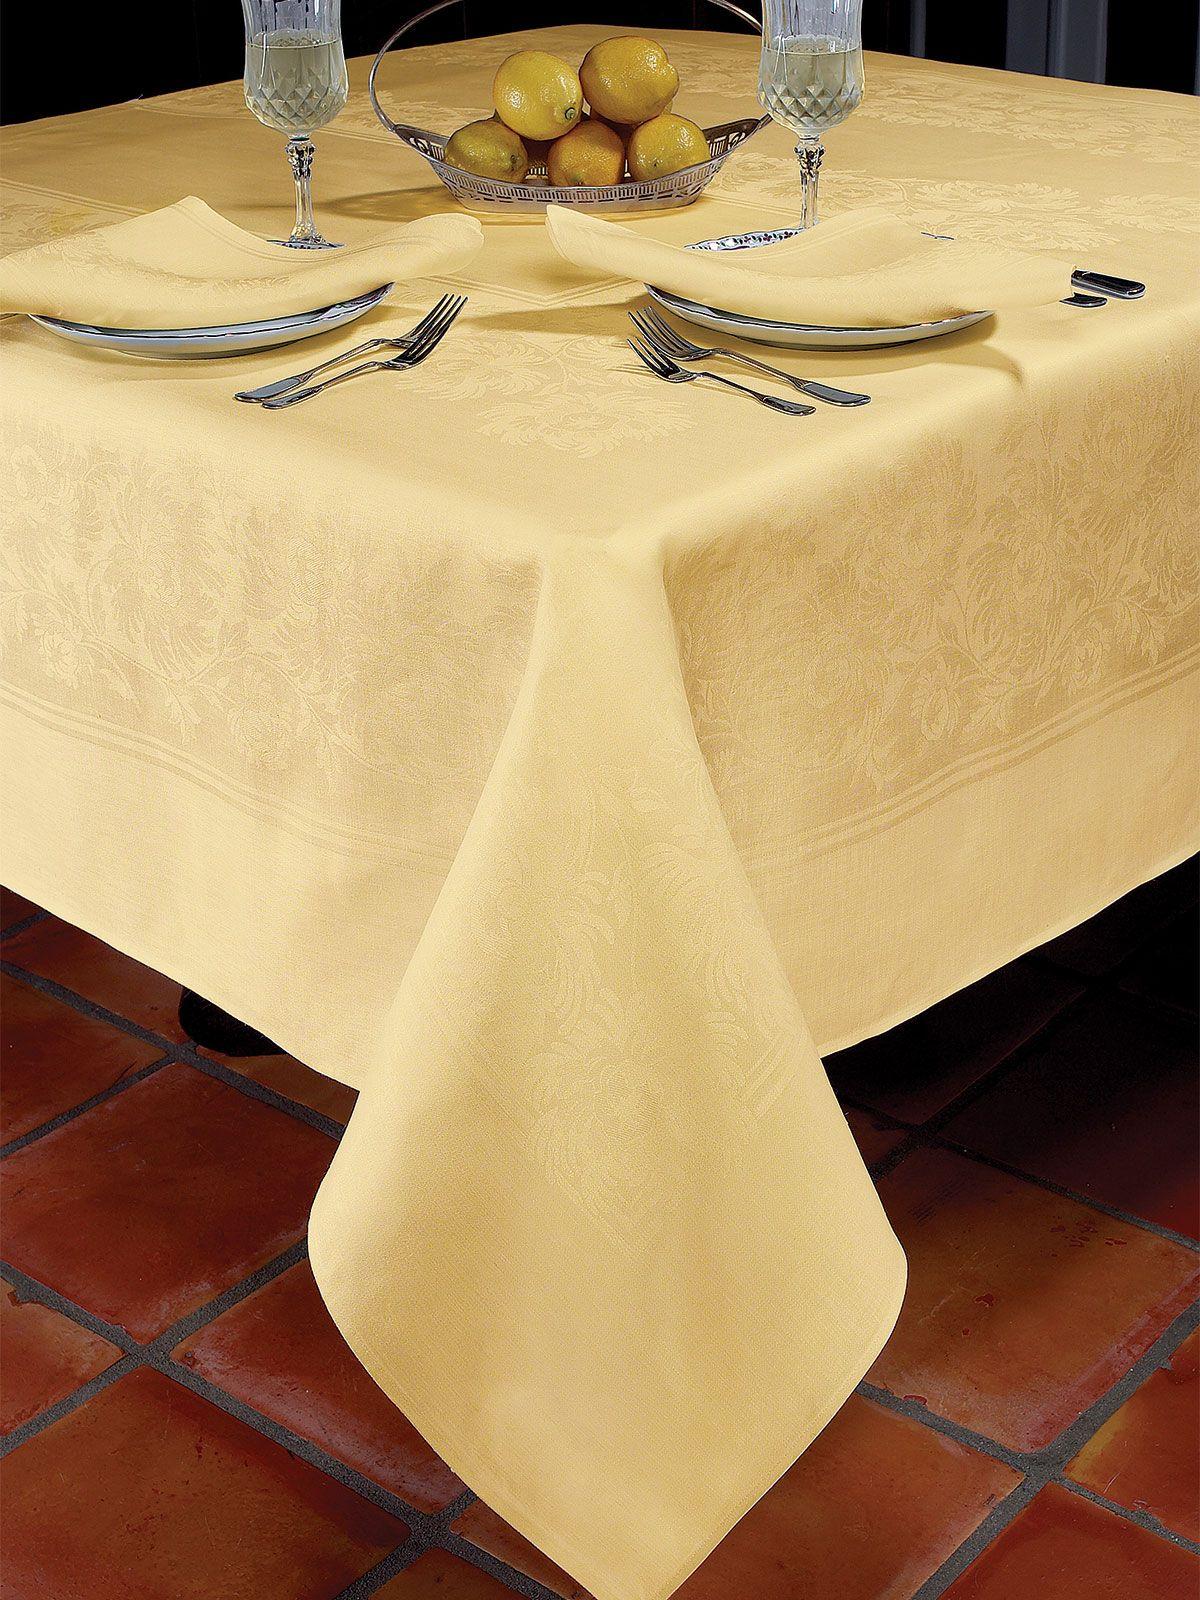 Chrysanthemum Fine Table Linens Schweitzer Linen In 2020 Luxury Table Damask Tablecloth Schweitzer Linen